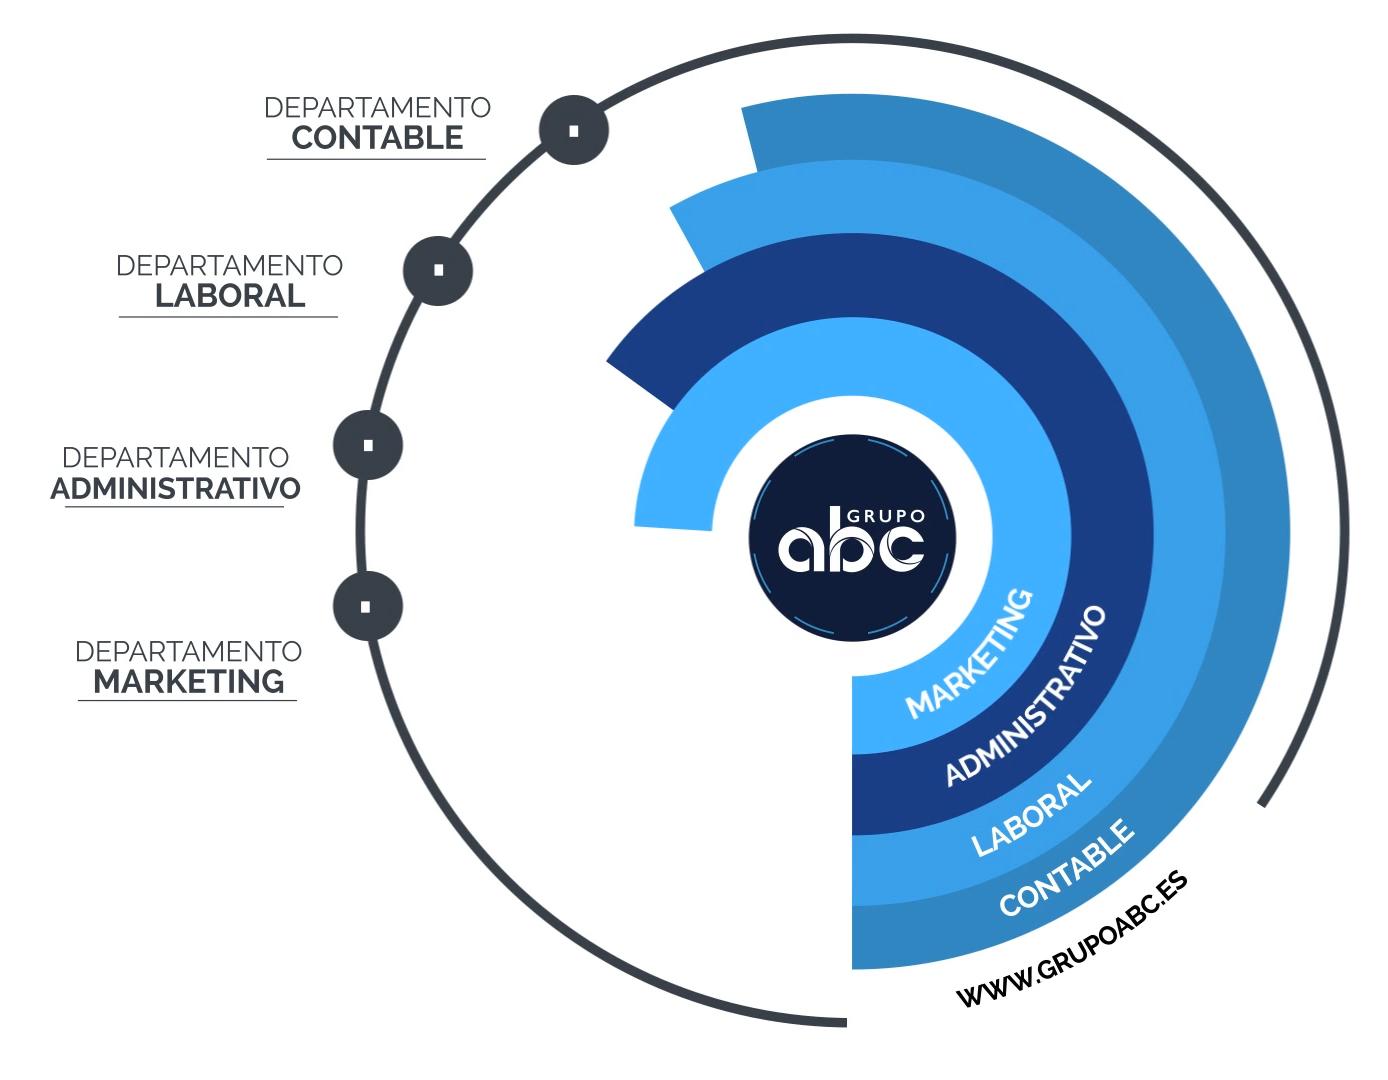 Grupo abc | Asesores tributarios y abogados en Vigo